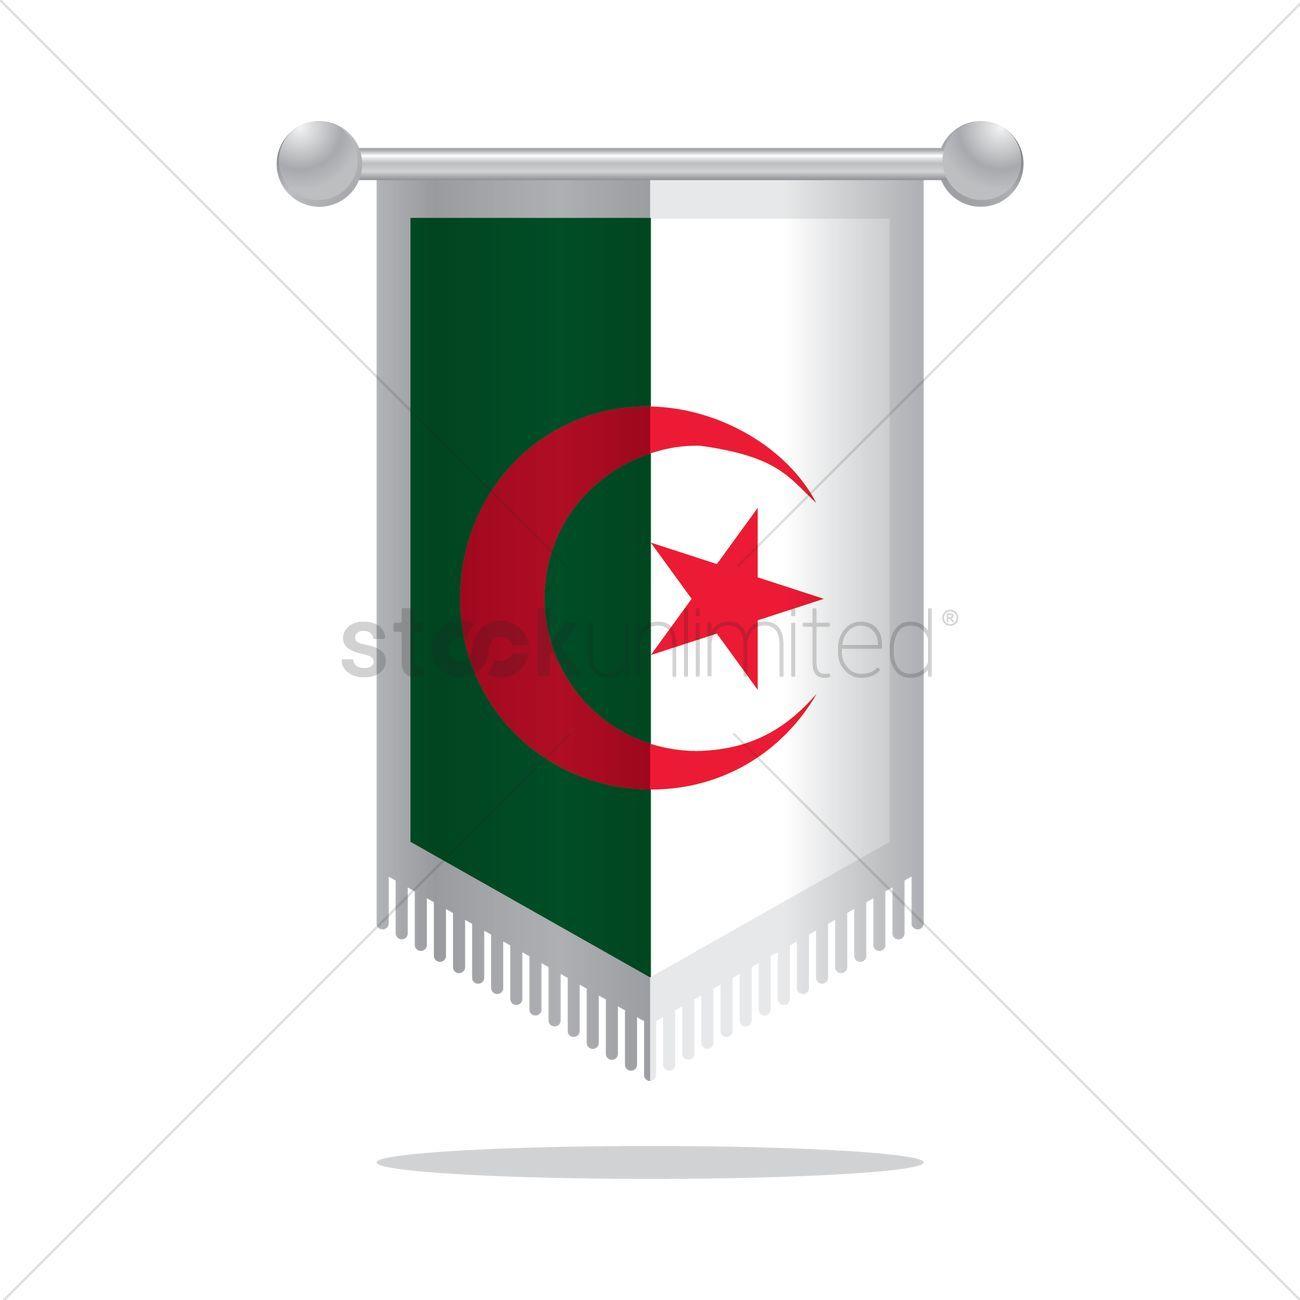 Pennant flag of algerian vectors, stock clipart , #AFF, #algerian, #flag, #Pennant, #clipart, #stock #affiliate